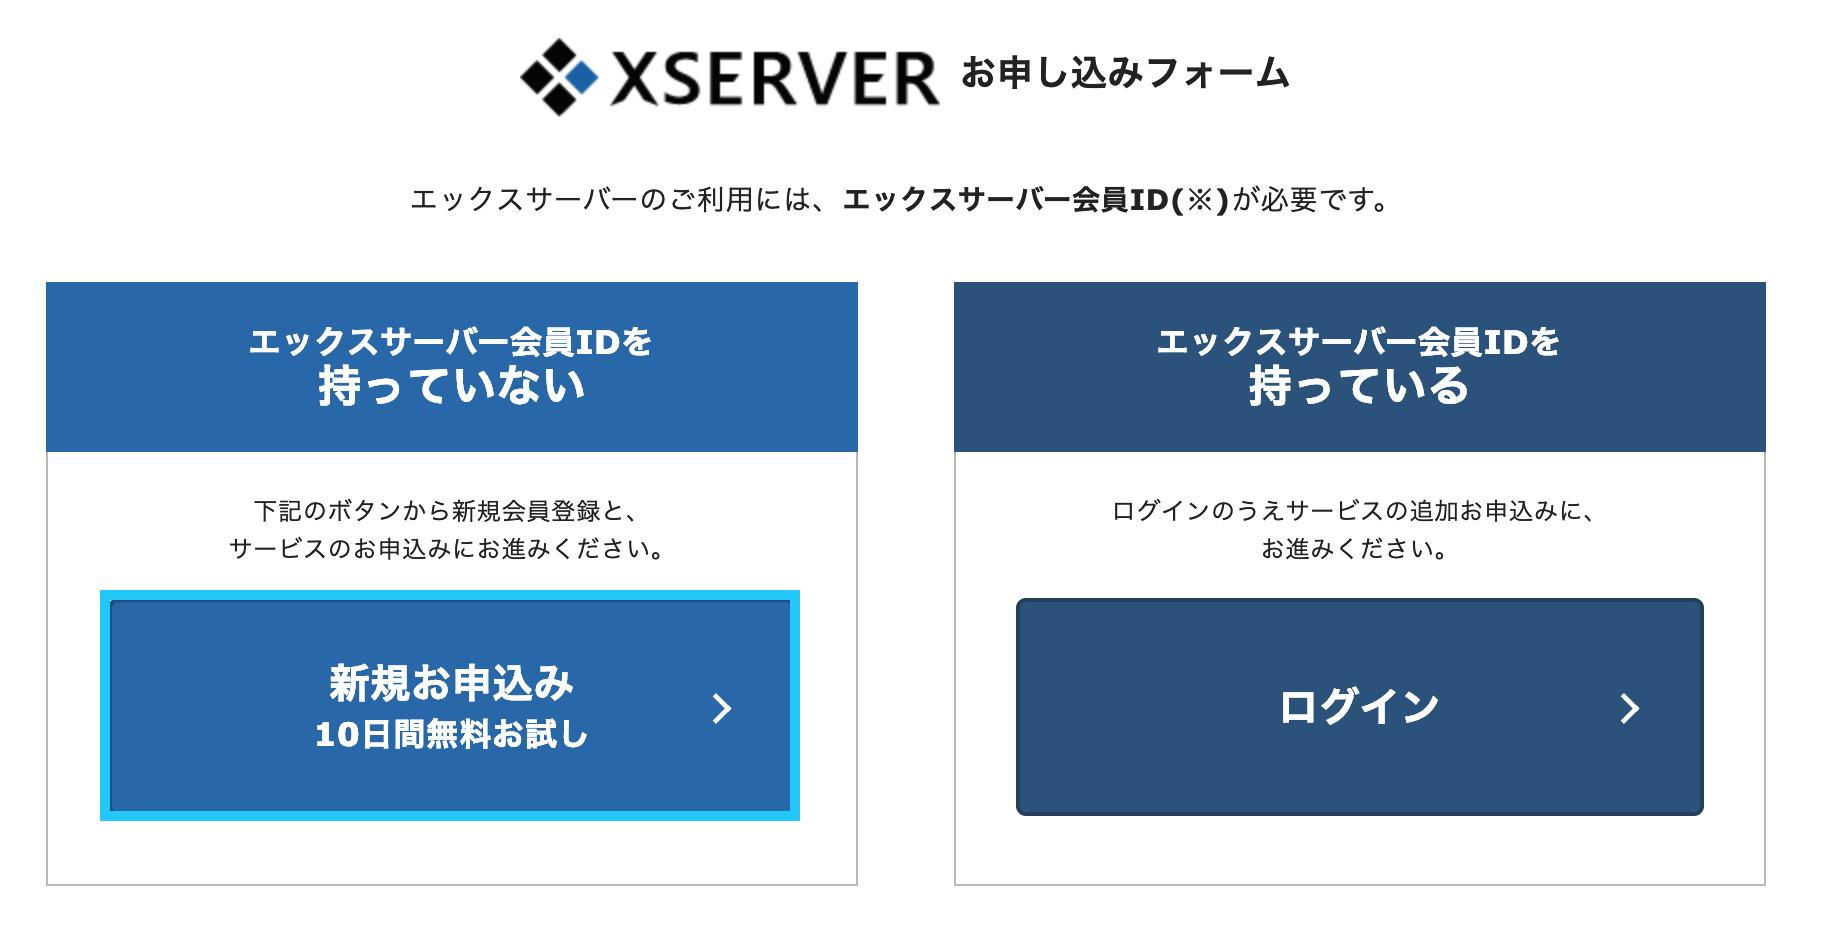 Xserverの新規申し込み